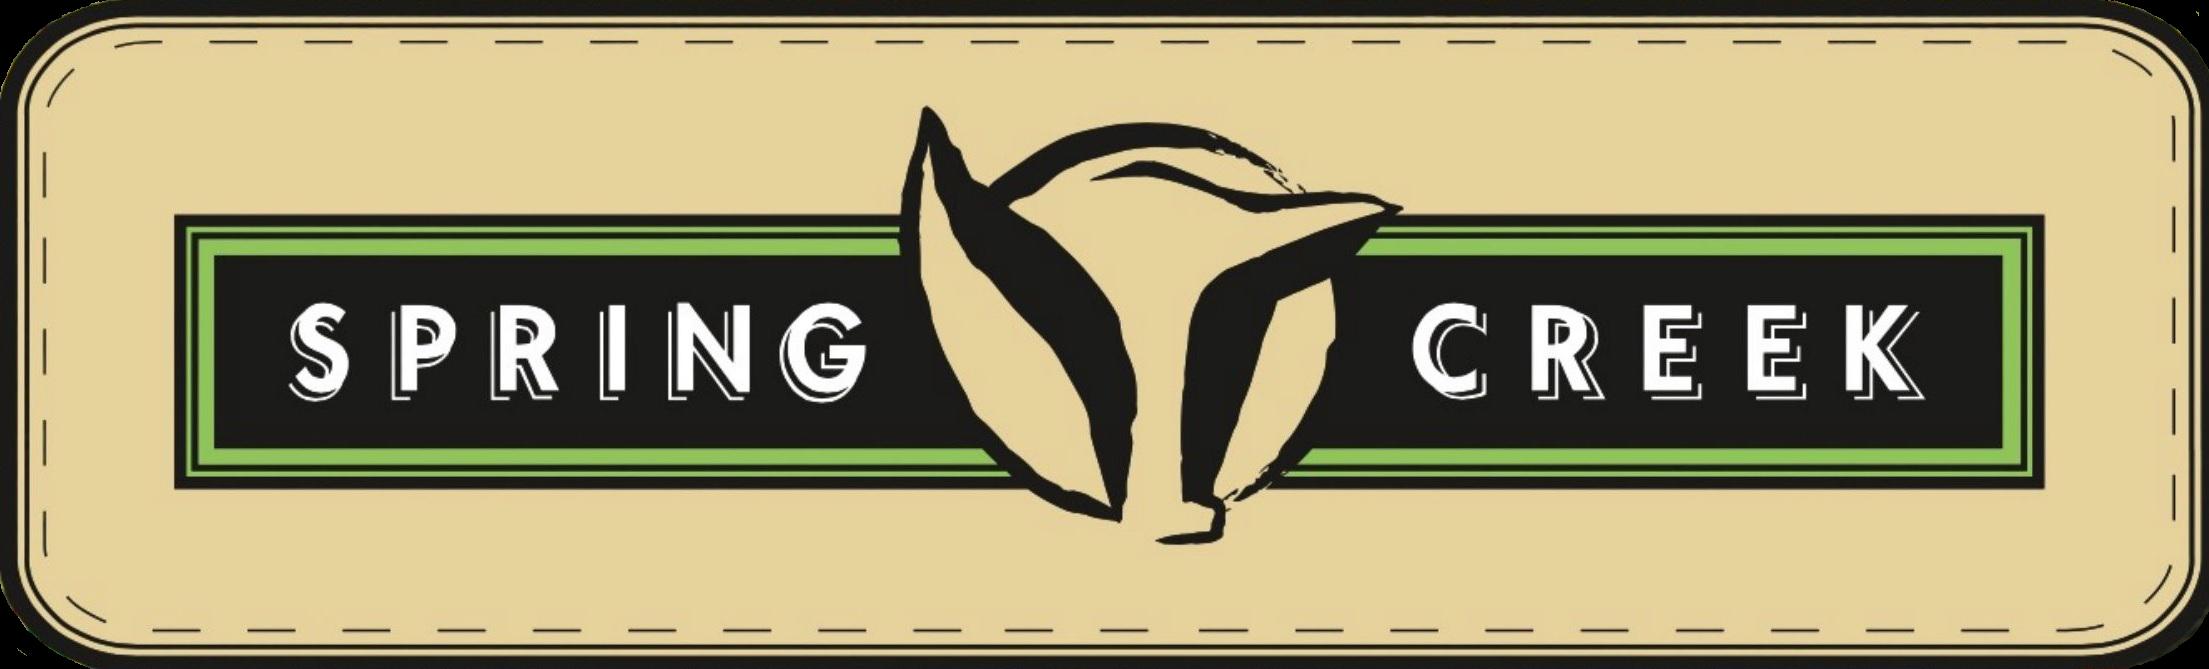 springcreek logo